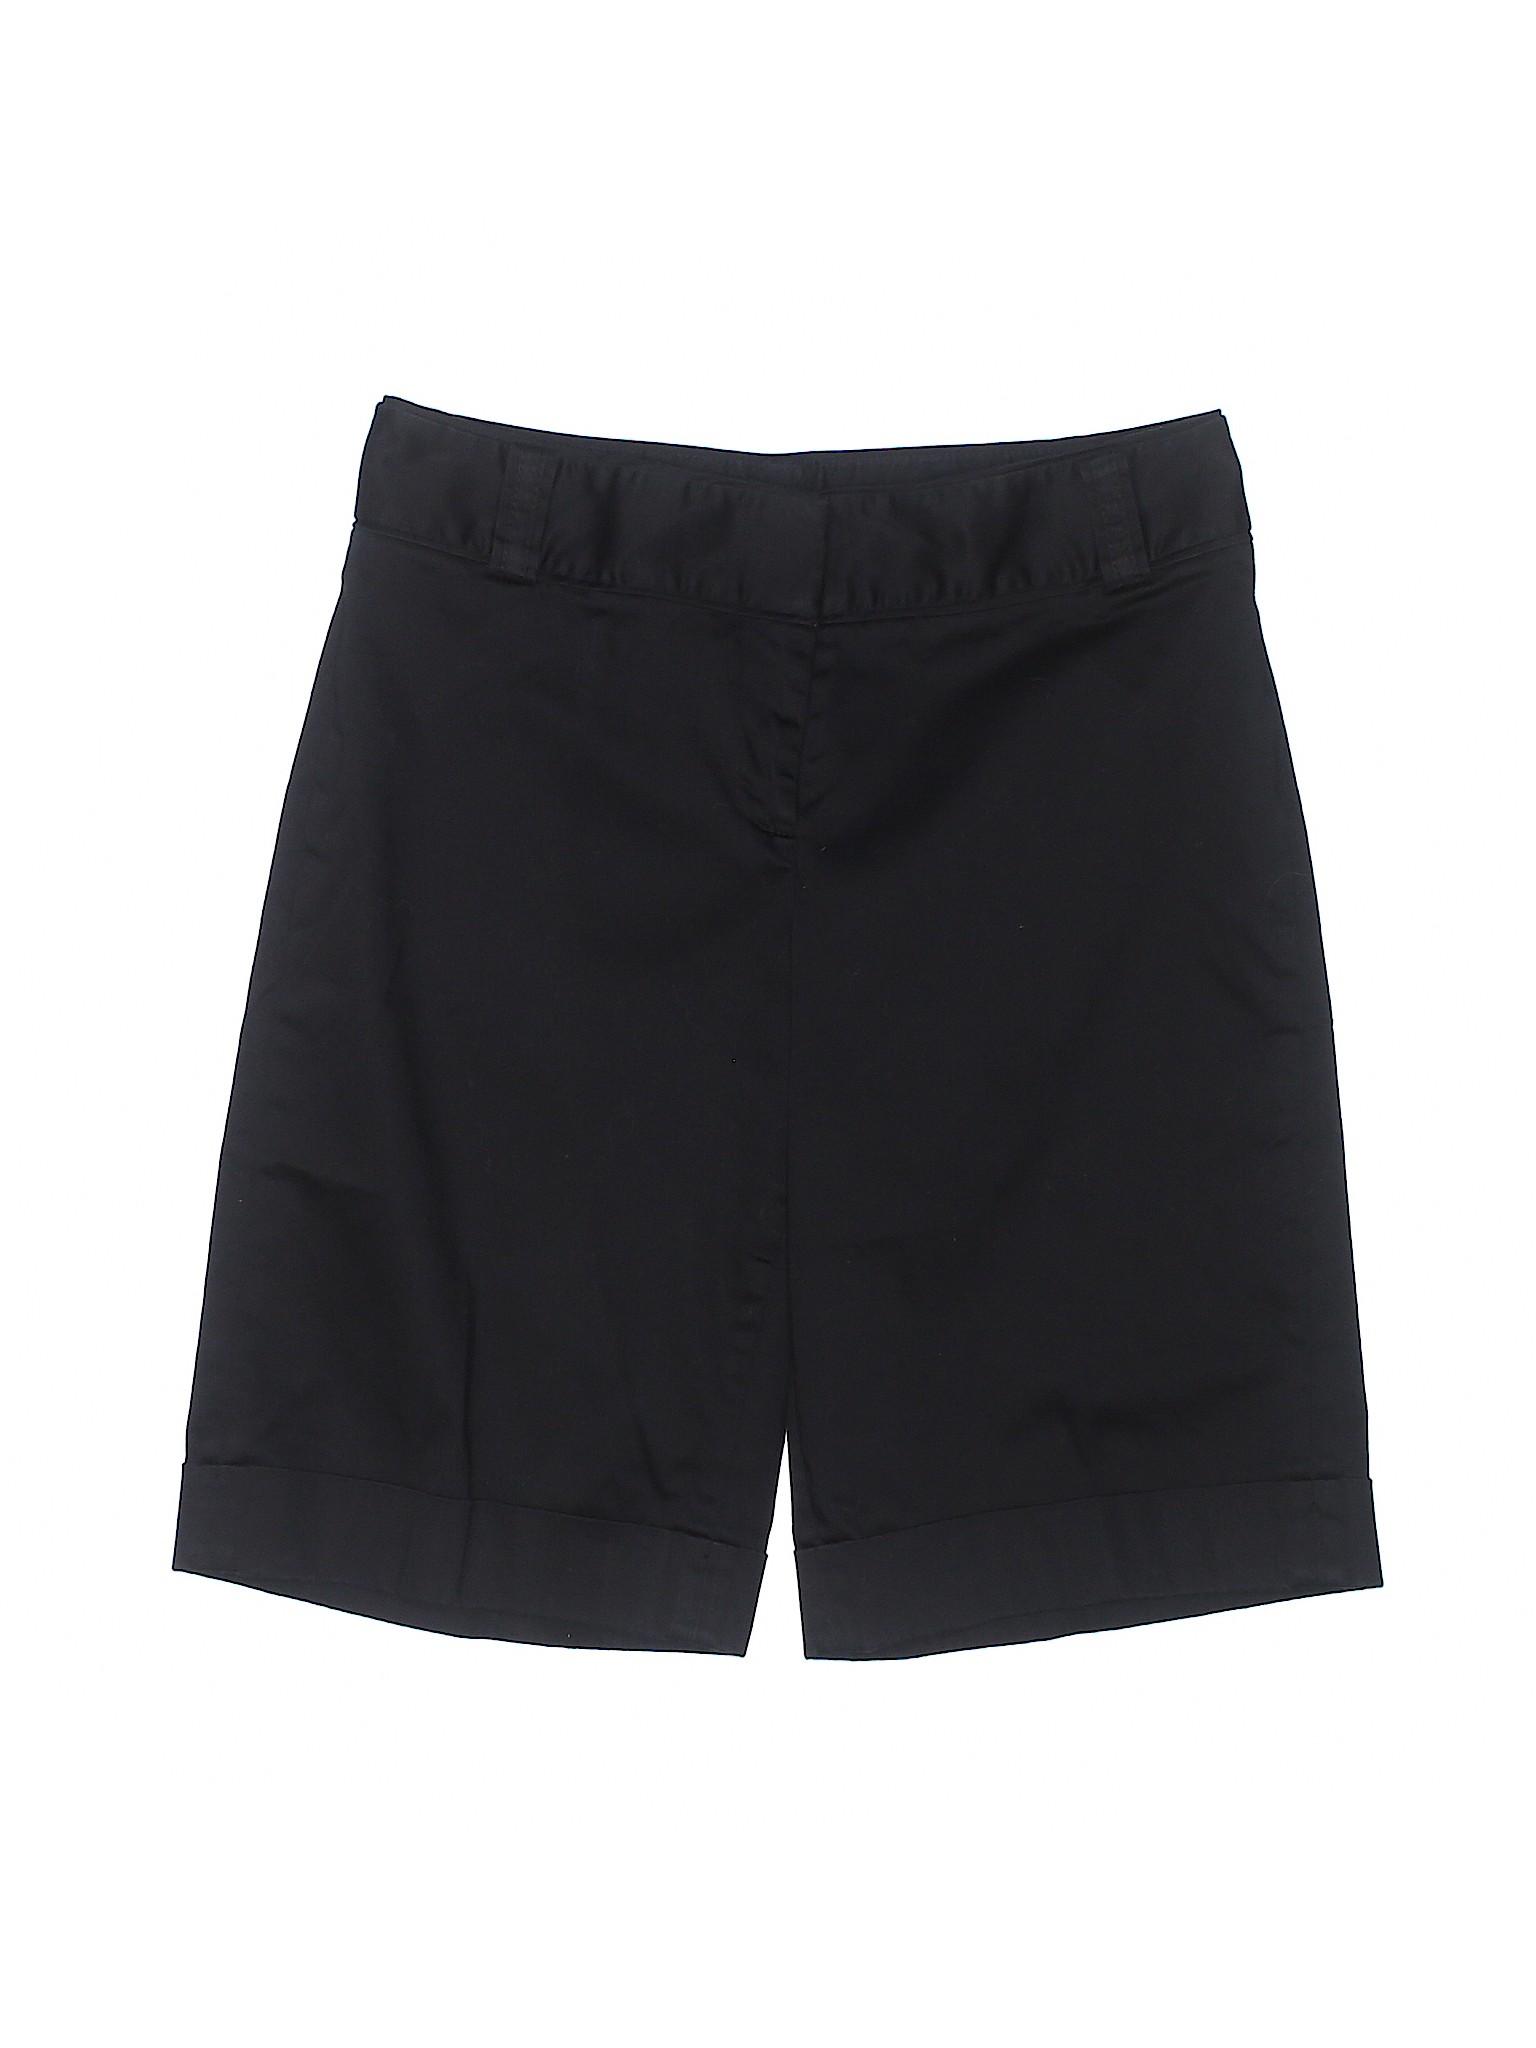 Leisure House Market Black Shorts winter White Khaki 8xORErq8w